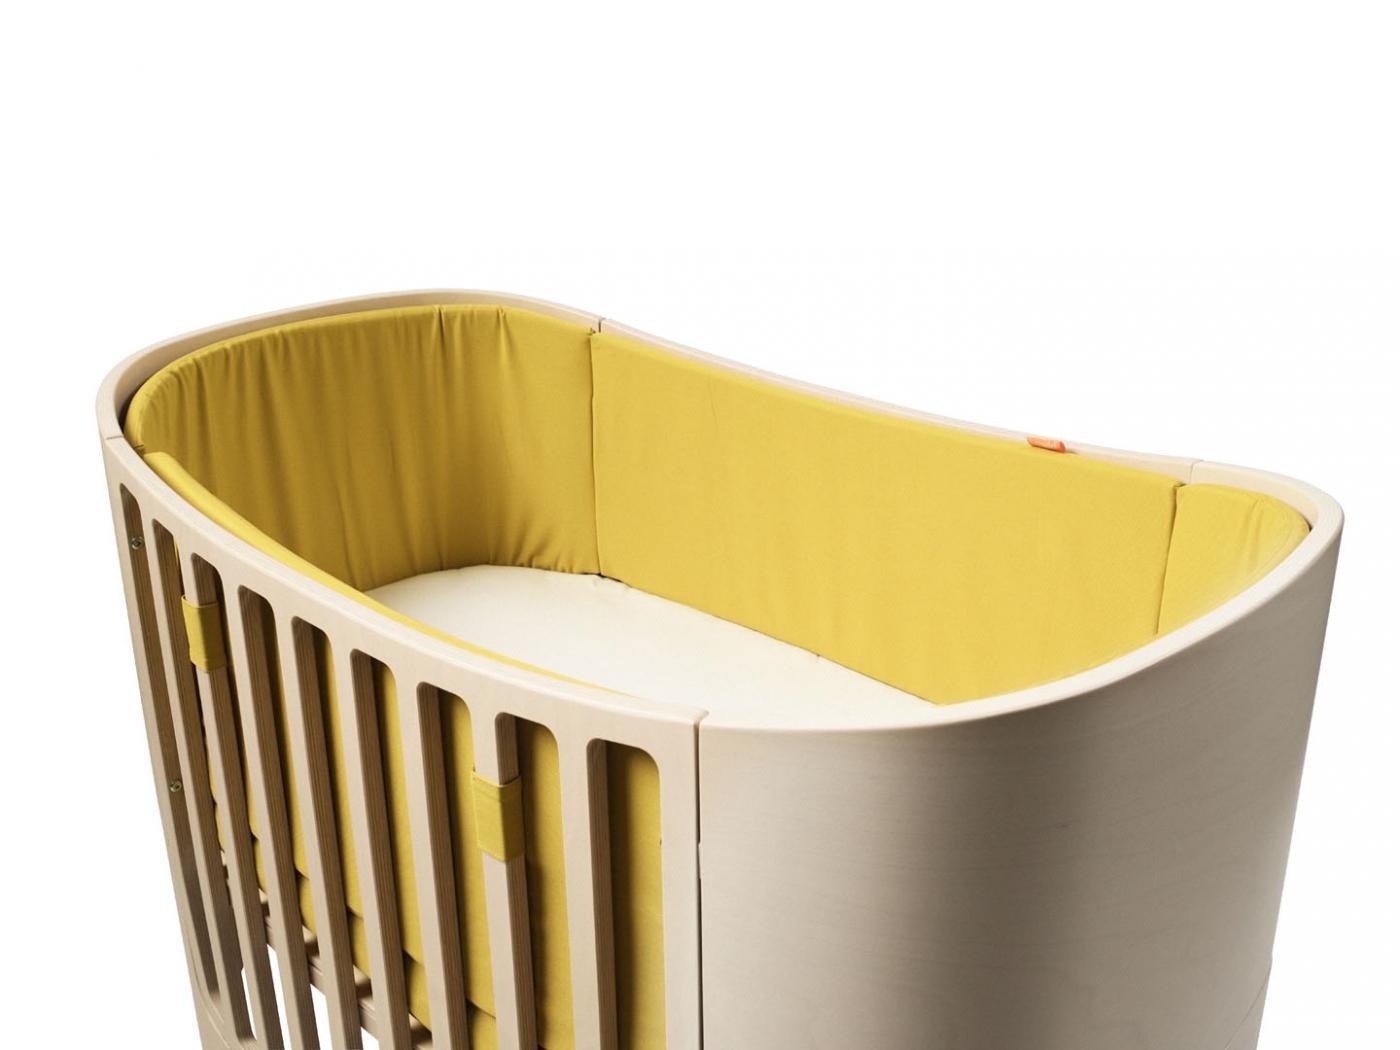 leander tour de lit curry. Black Bedroom Furniture Sets. Home Design Ideas